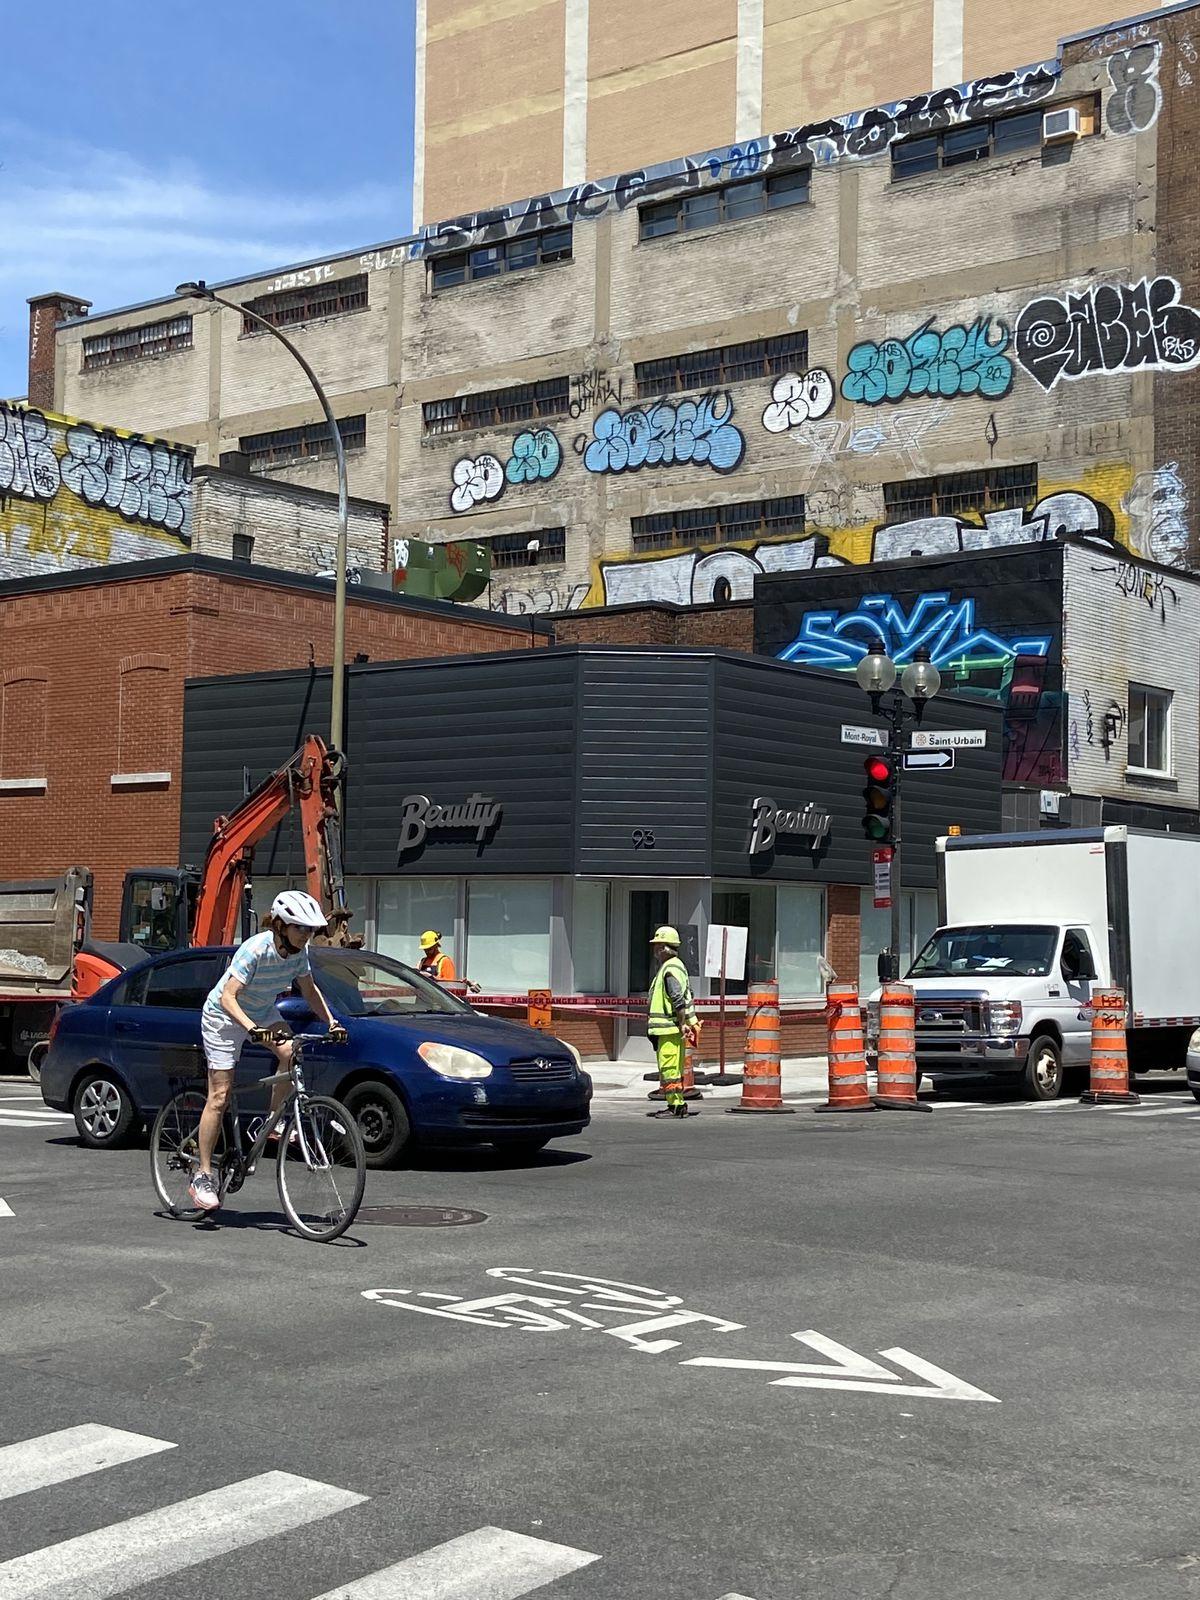 construction cones, cars, bikers in front of Beautys